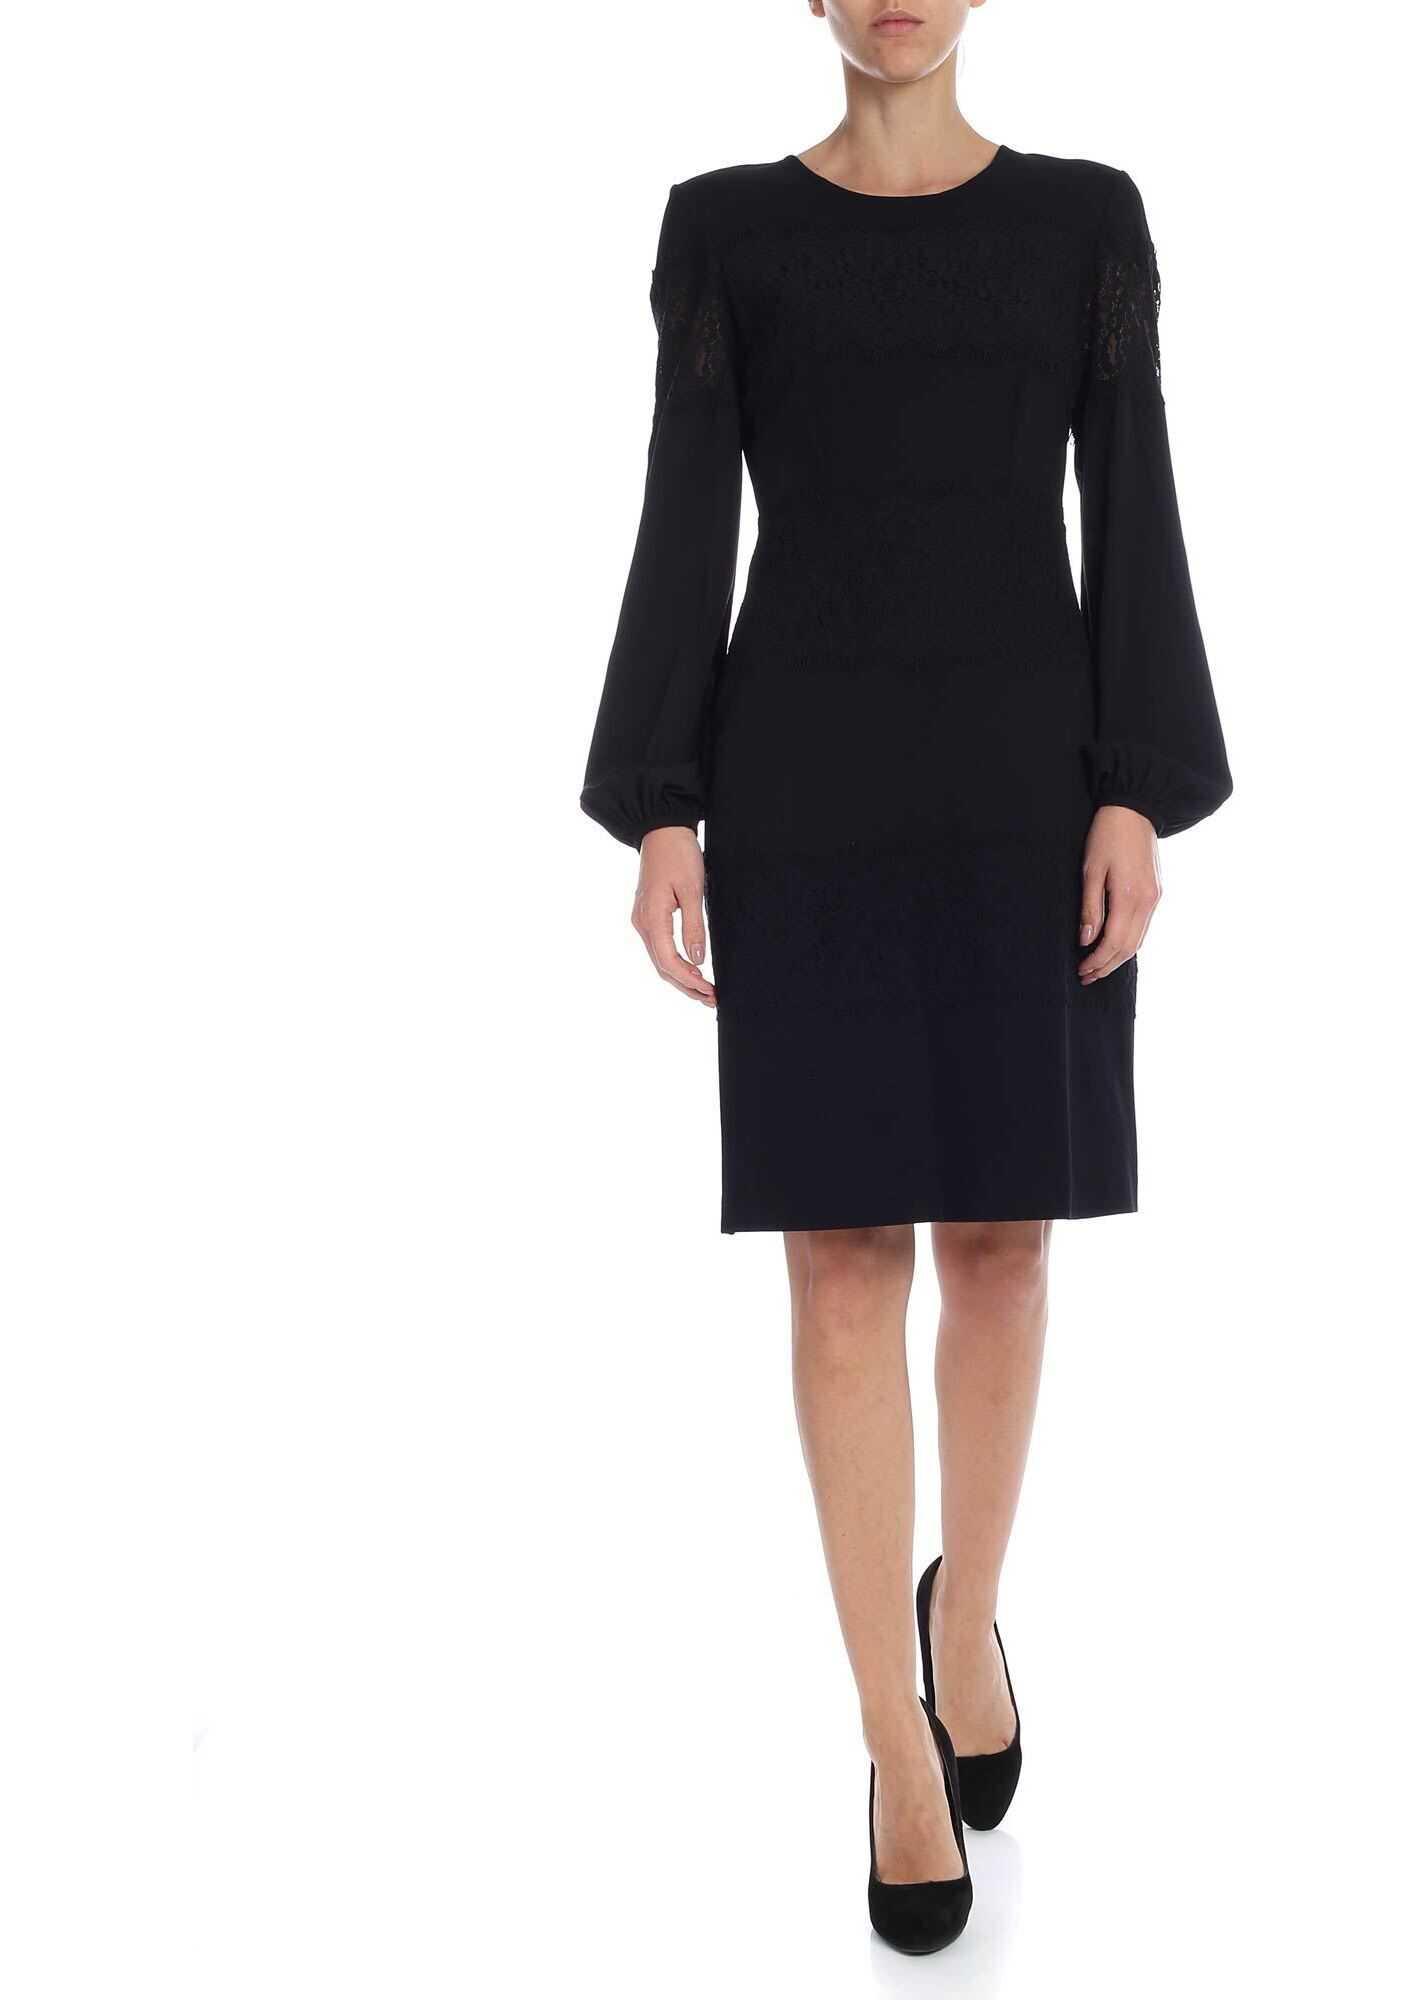 Black Dress With Lace Details thumbnail